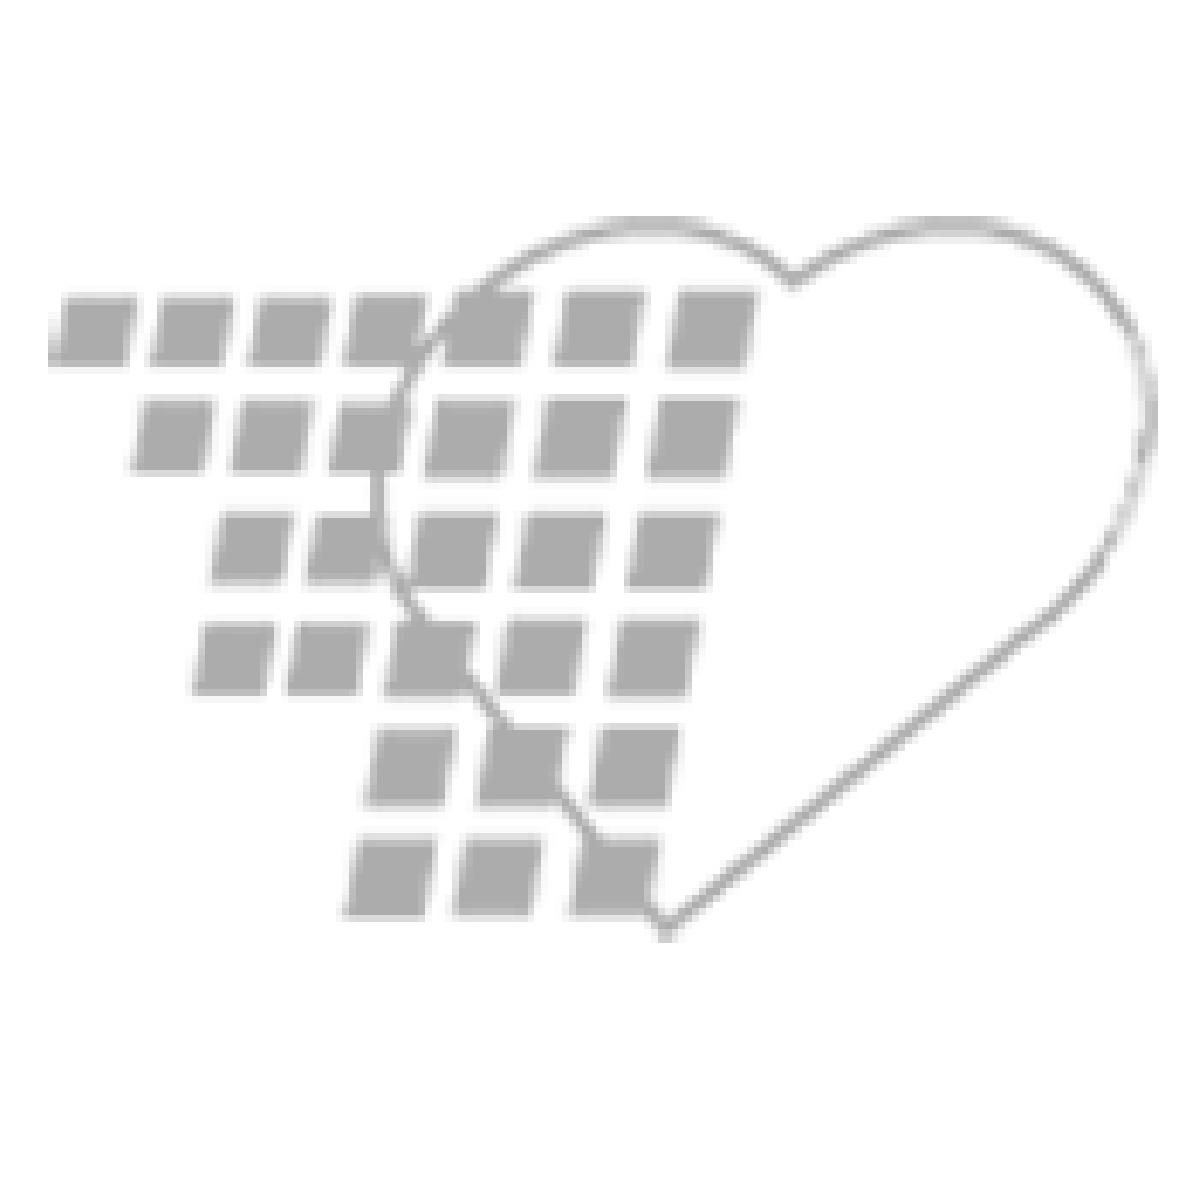 11-94-0051 - Laerdal SimPad® eLearning (8 Licenses)